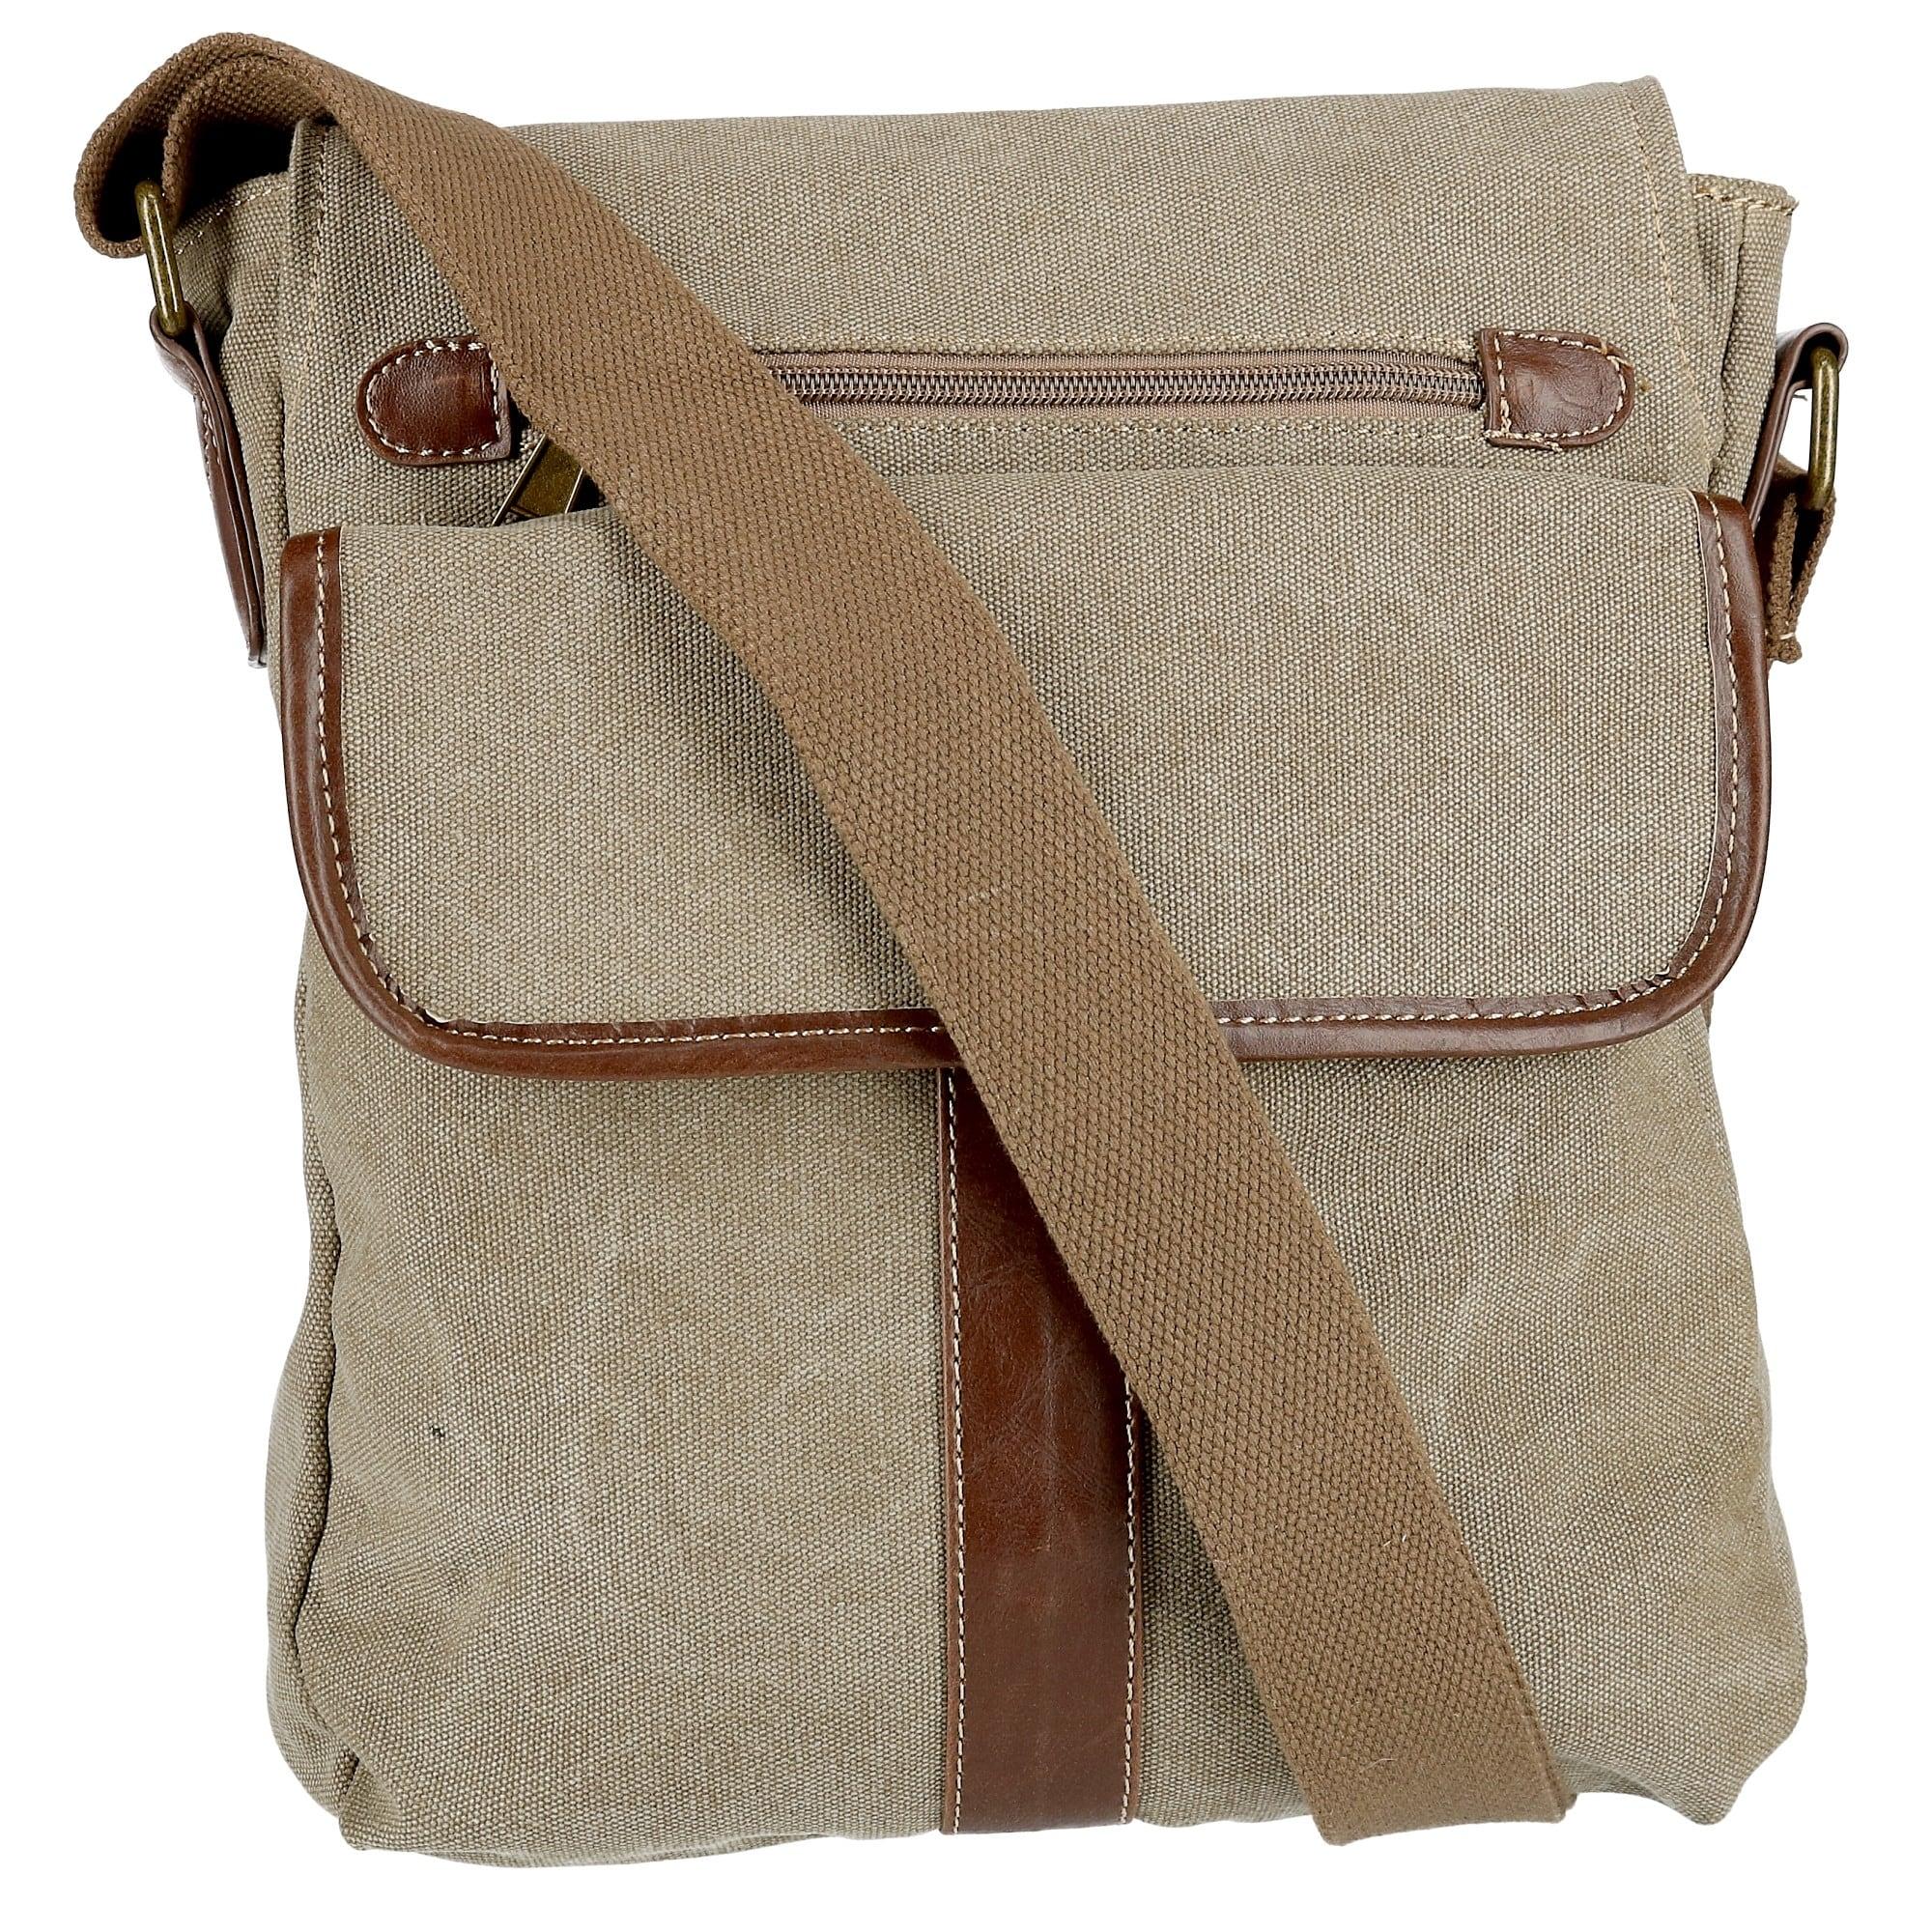 Cargoit Women S Cotton Canvas Crossbody Bag One Size